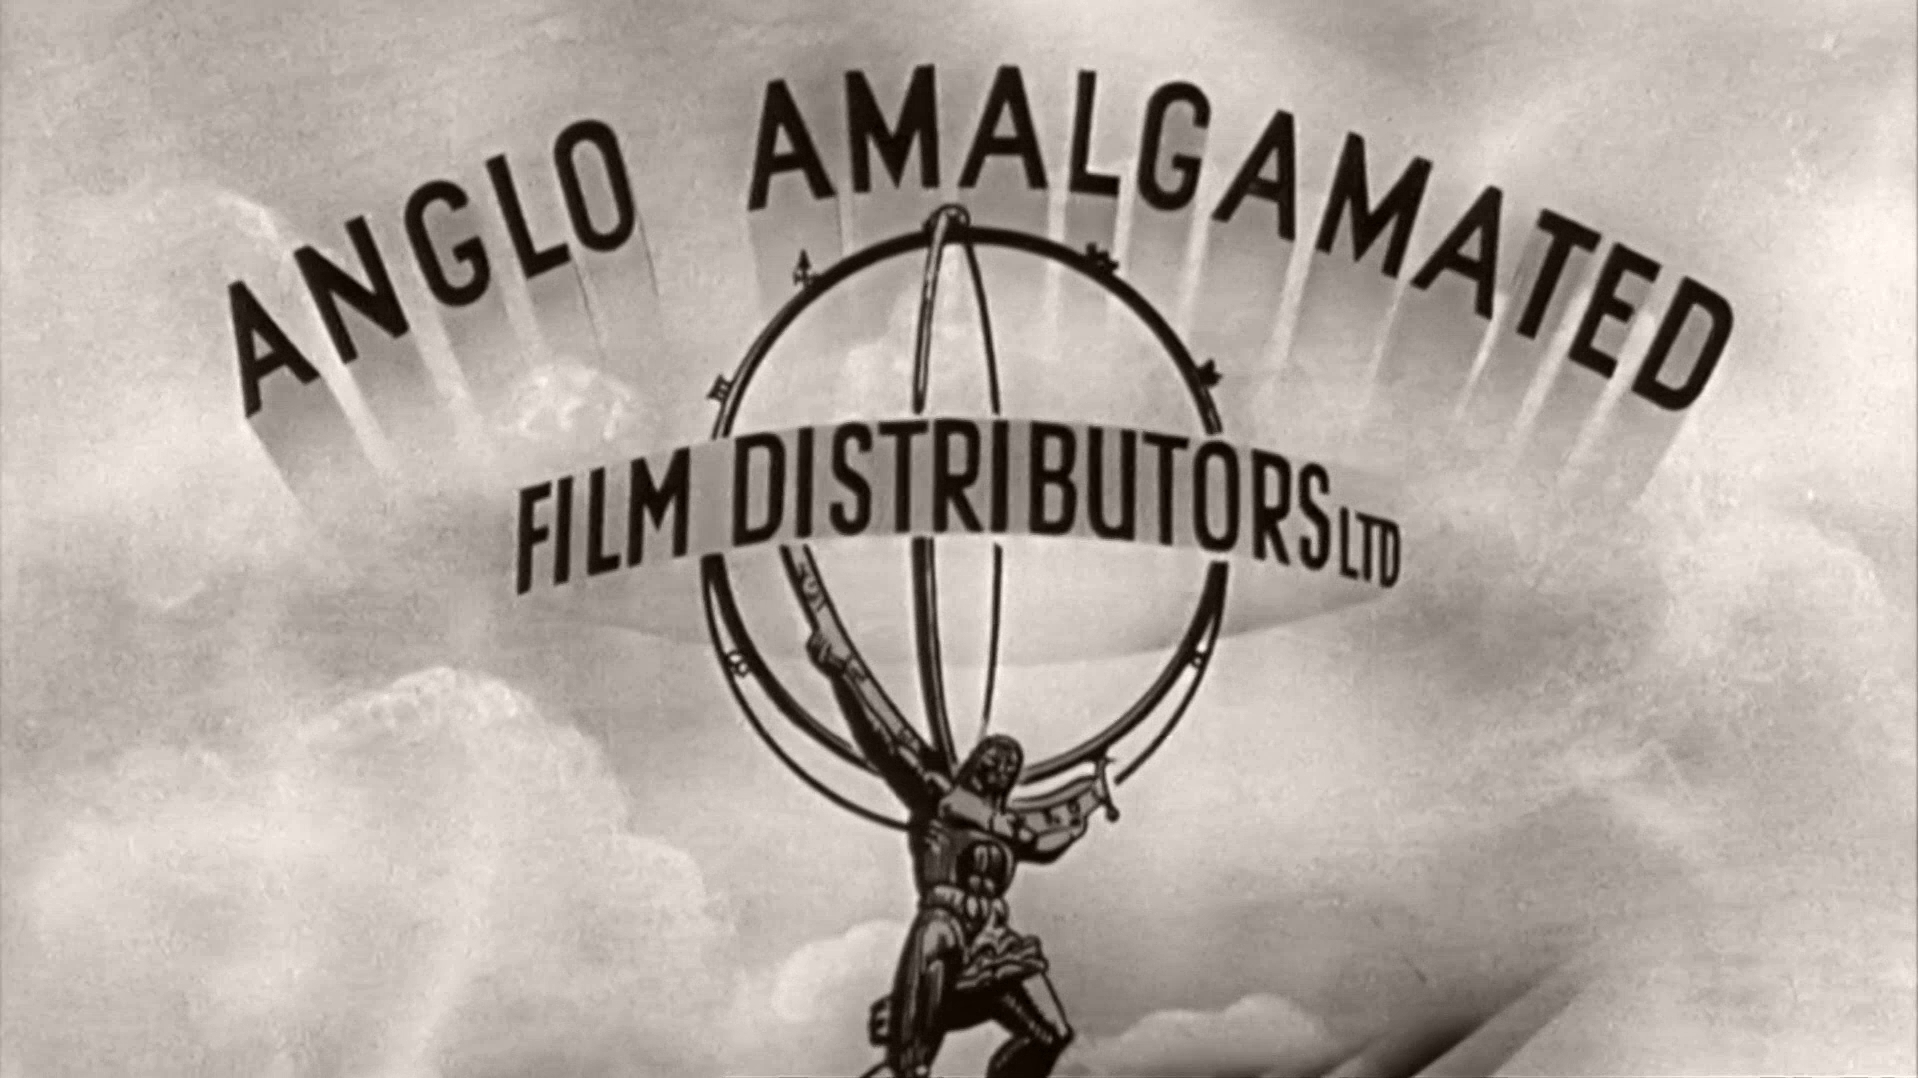 Main title from Carry On Nurse (1959) (1). Anglo Amalgamated Film Distributors Ltd